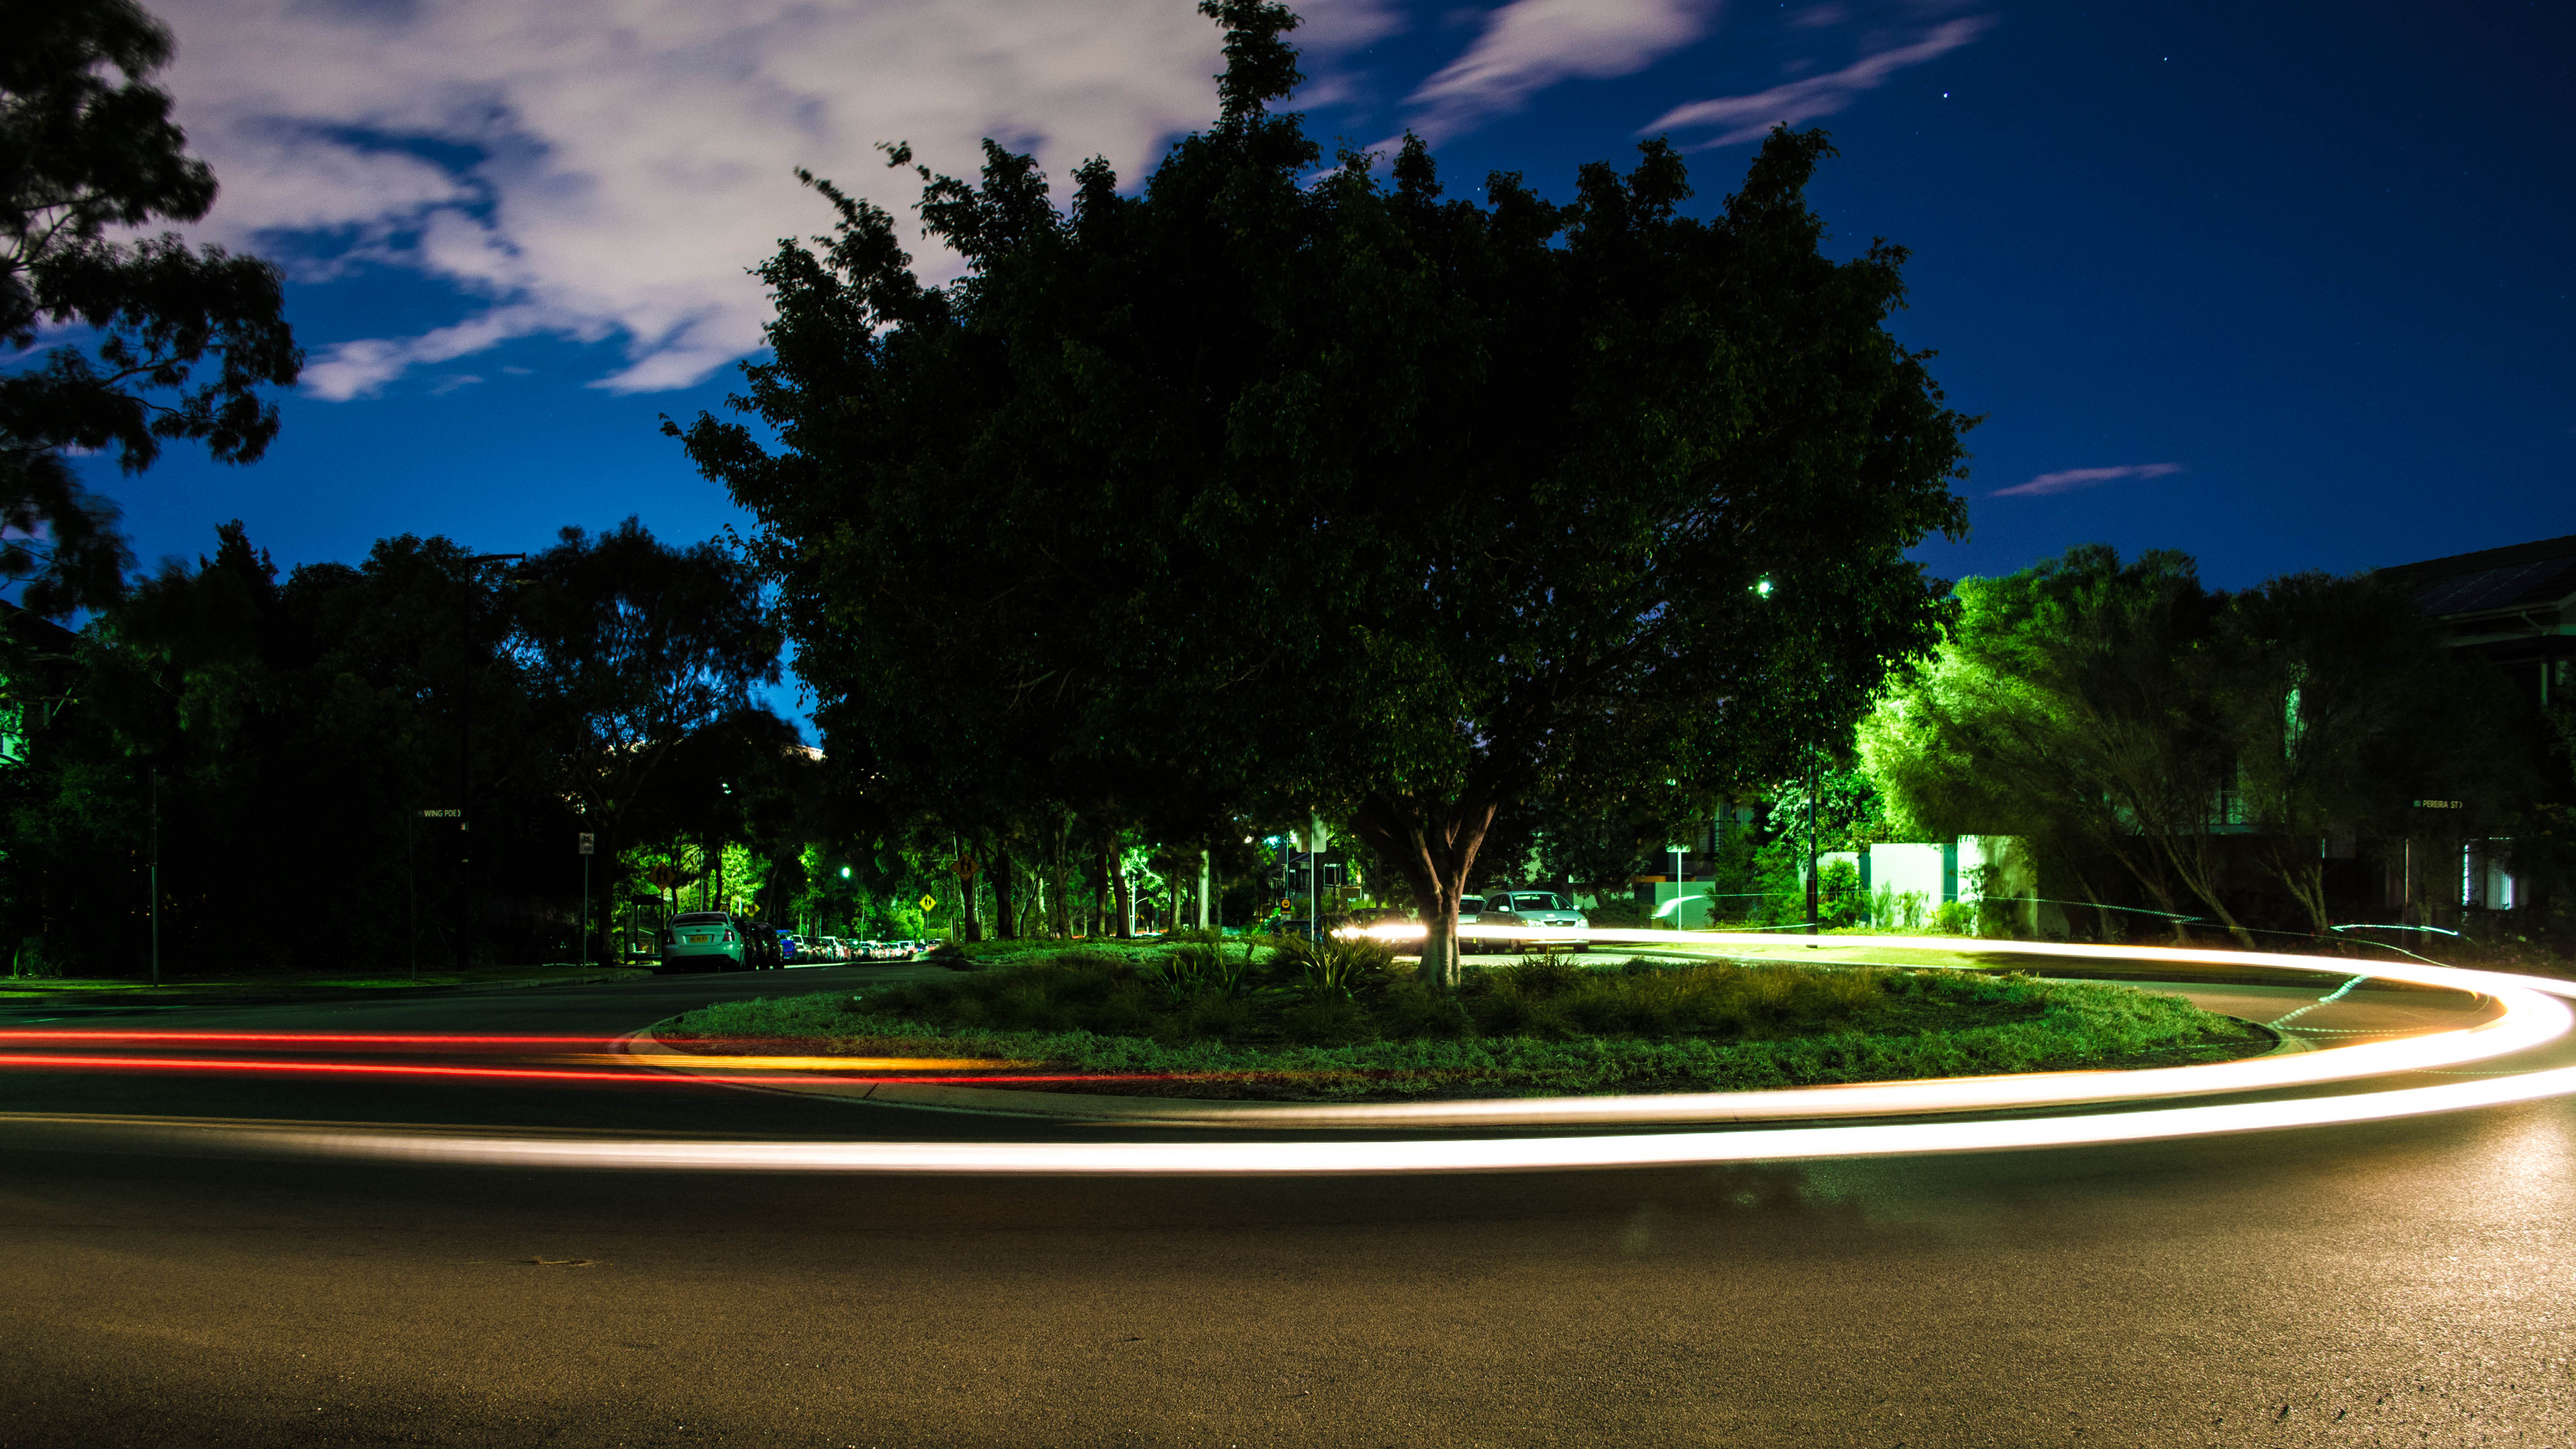 BOTPOST] Roundabout [3840x2160] iimgurcom 3840x2160